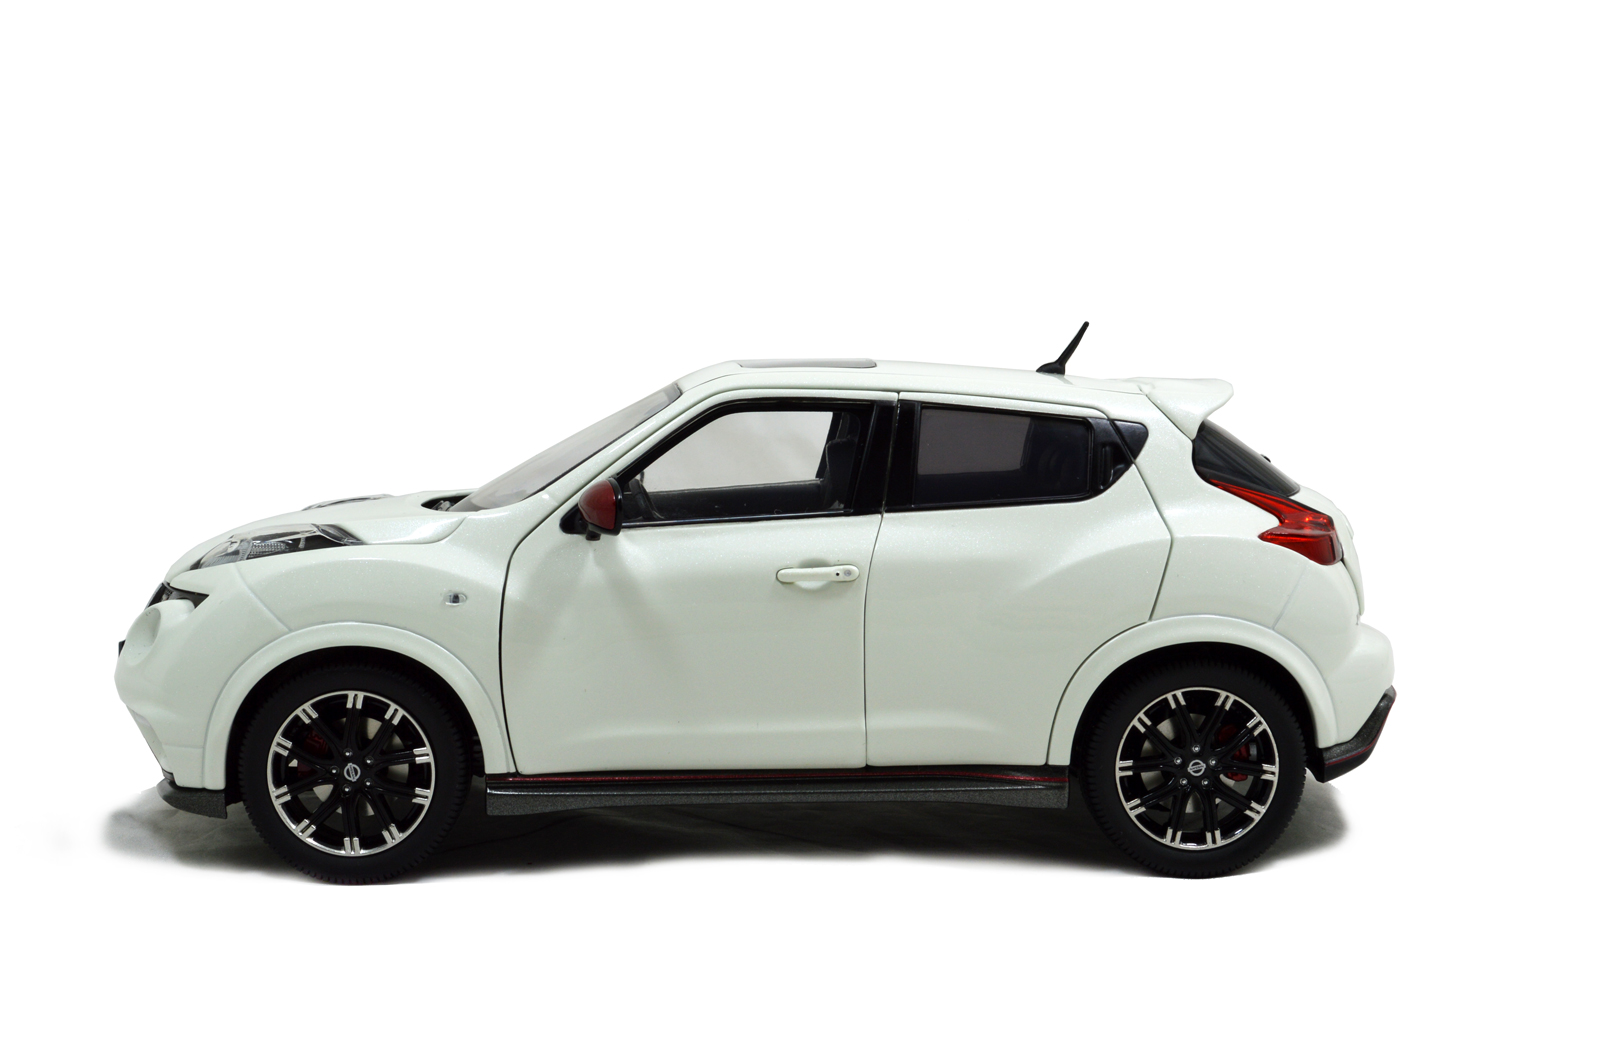 Nissan Juke Nismo RS 2014 1/18 Scale Diecast Model Car Wholesale 12